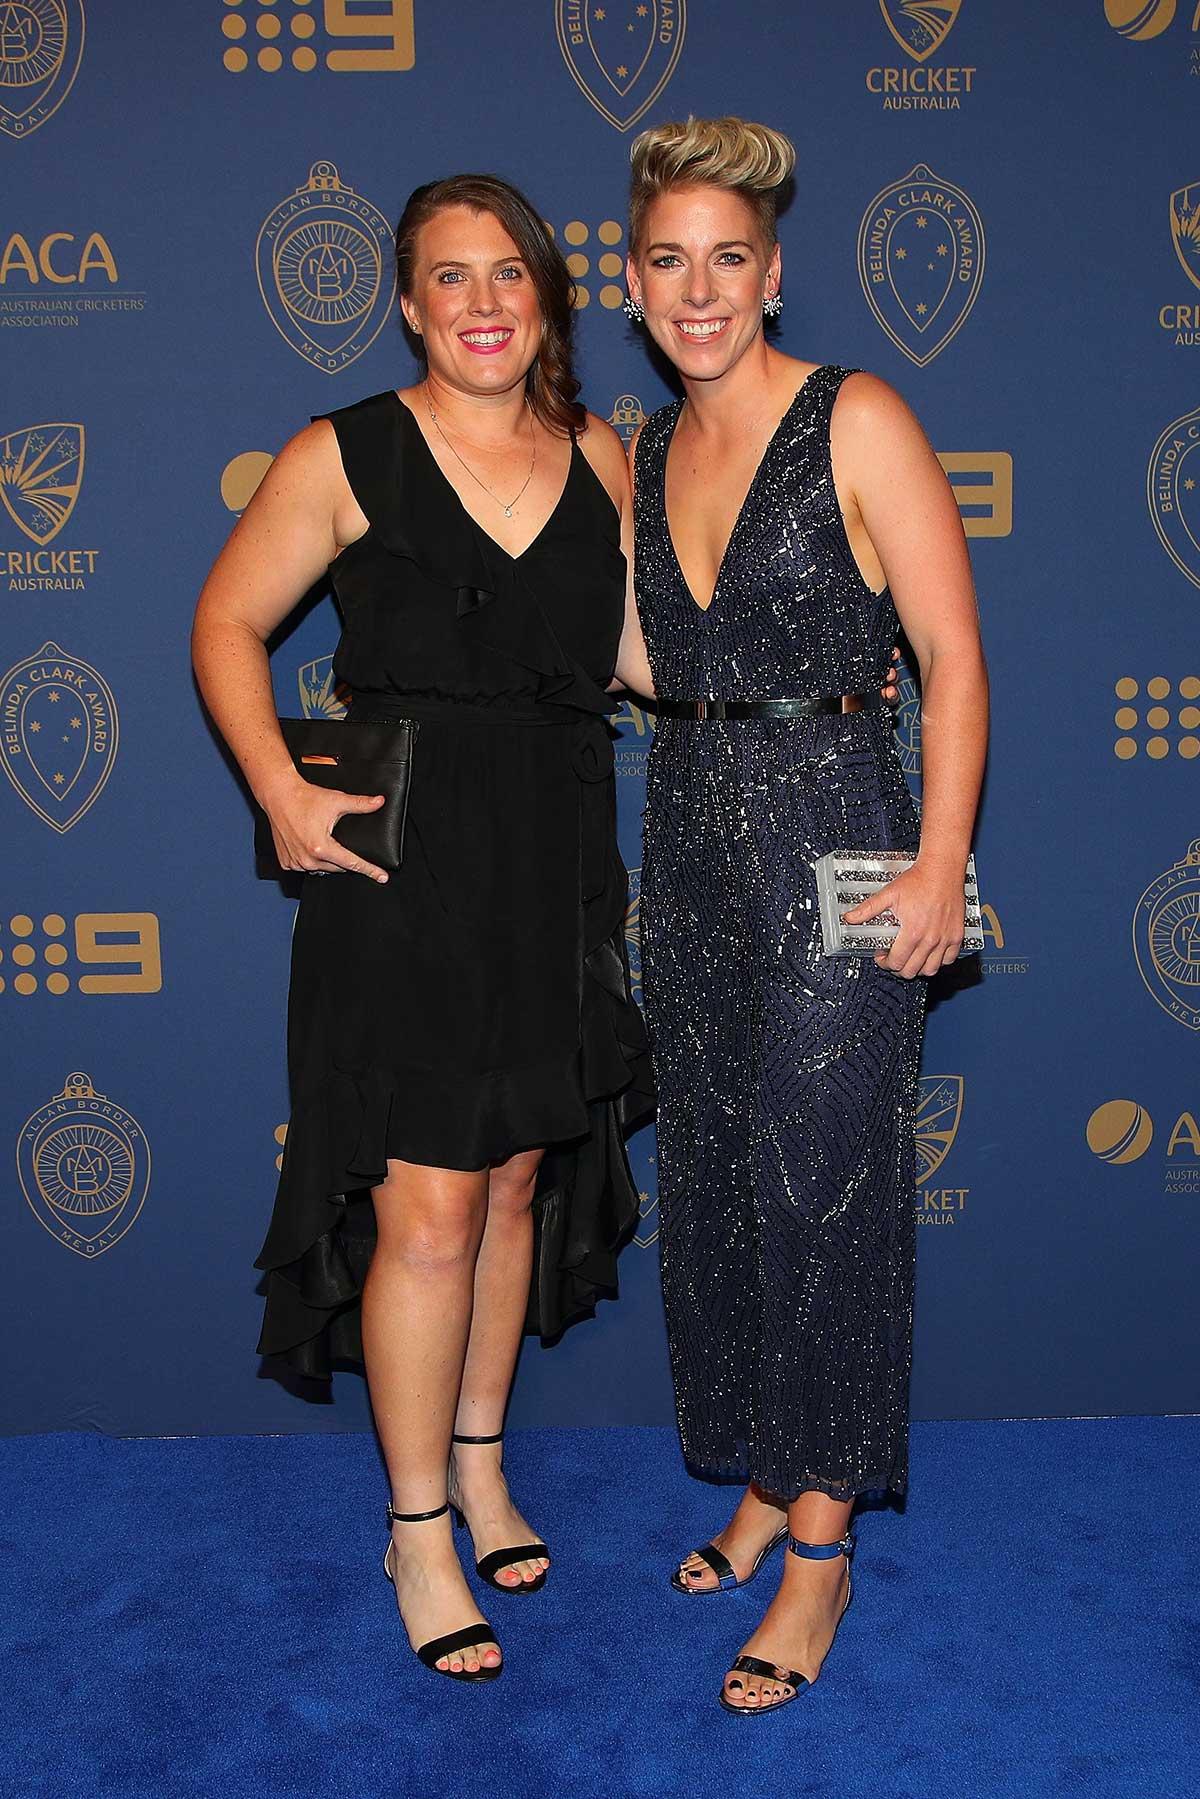 Australia cricketer Elyse Villani and Lauren Morecroft // Getty